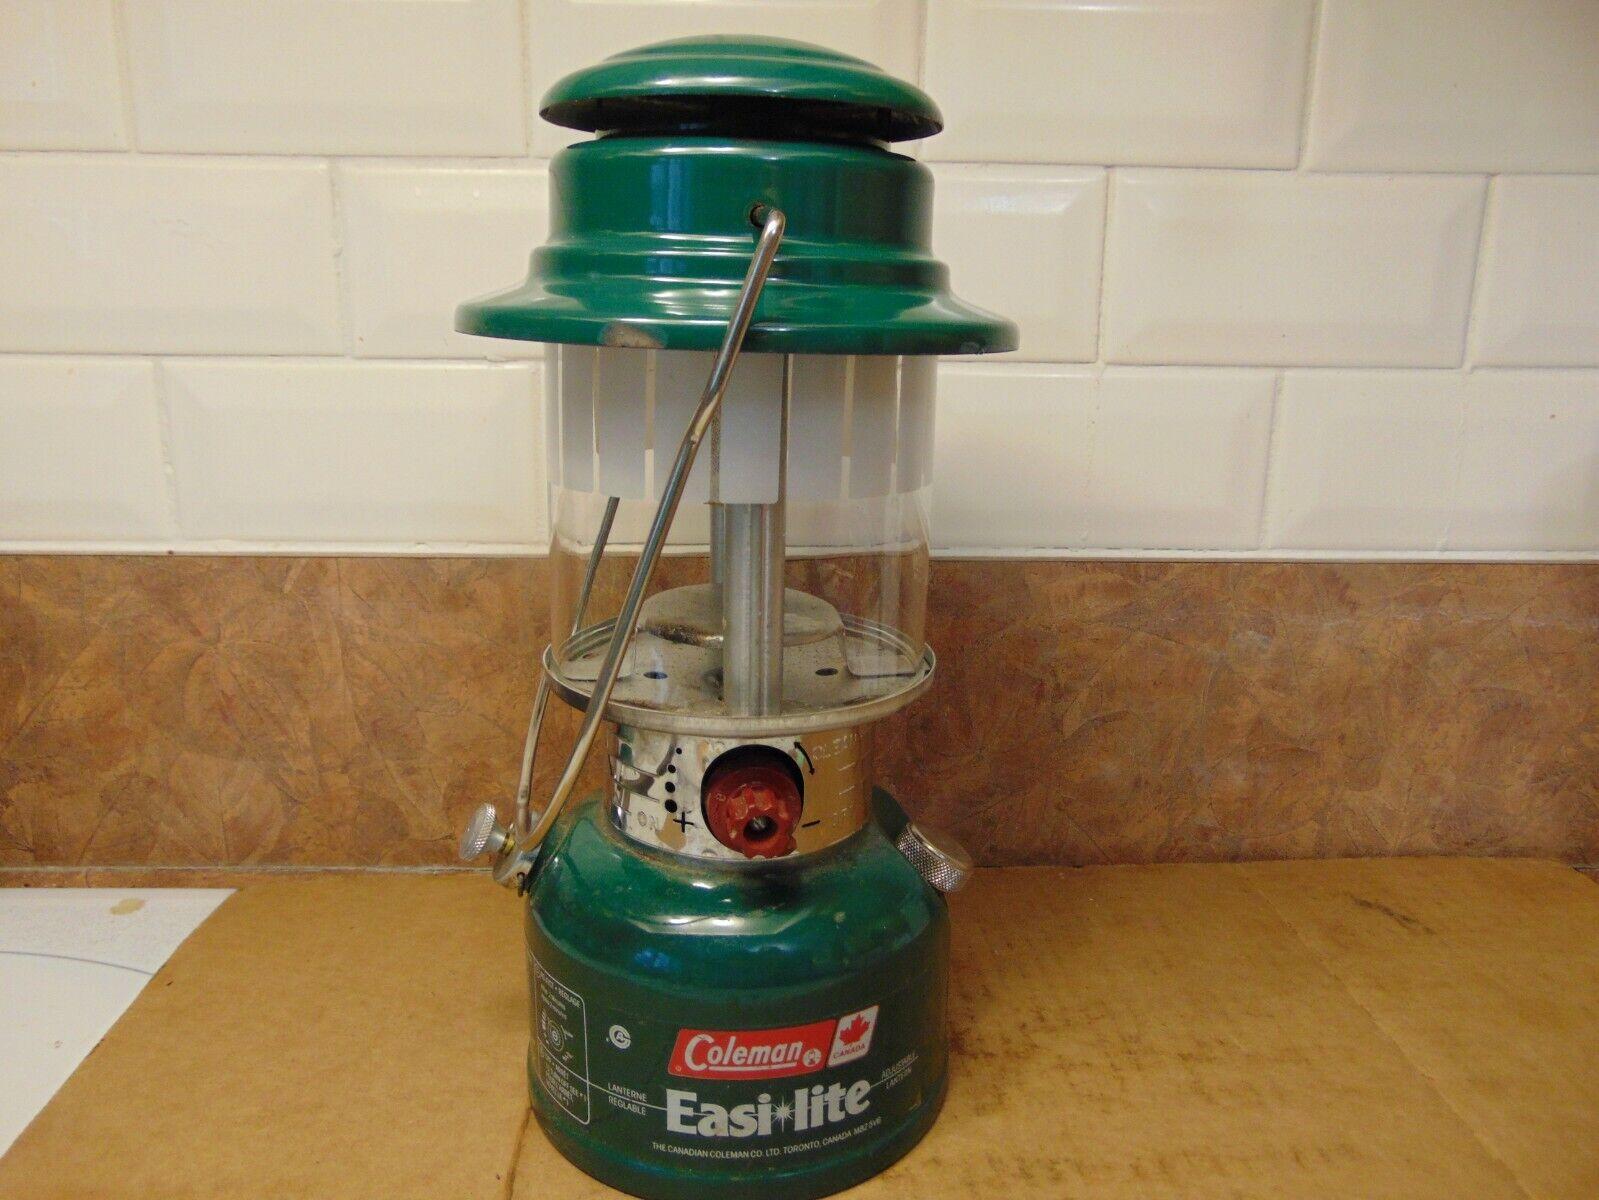 Vintage   lantern coleman    325   nice  high-quality merchandise and convenient, honest service